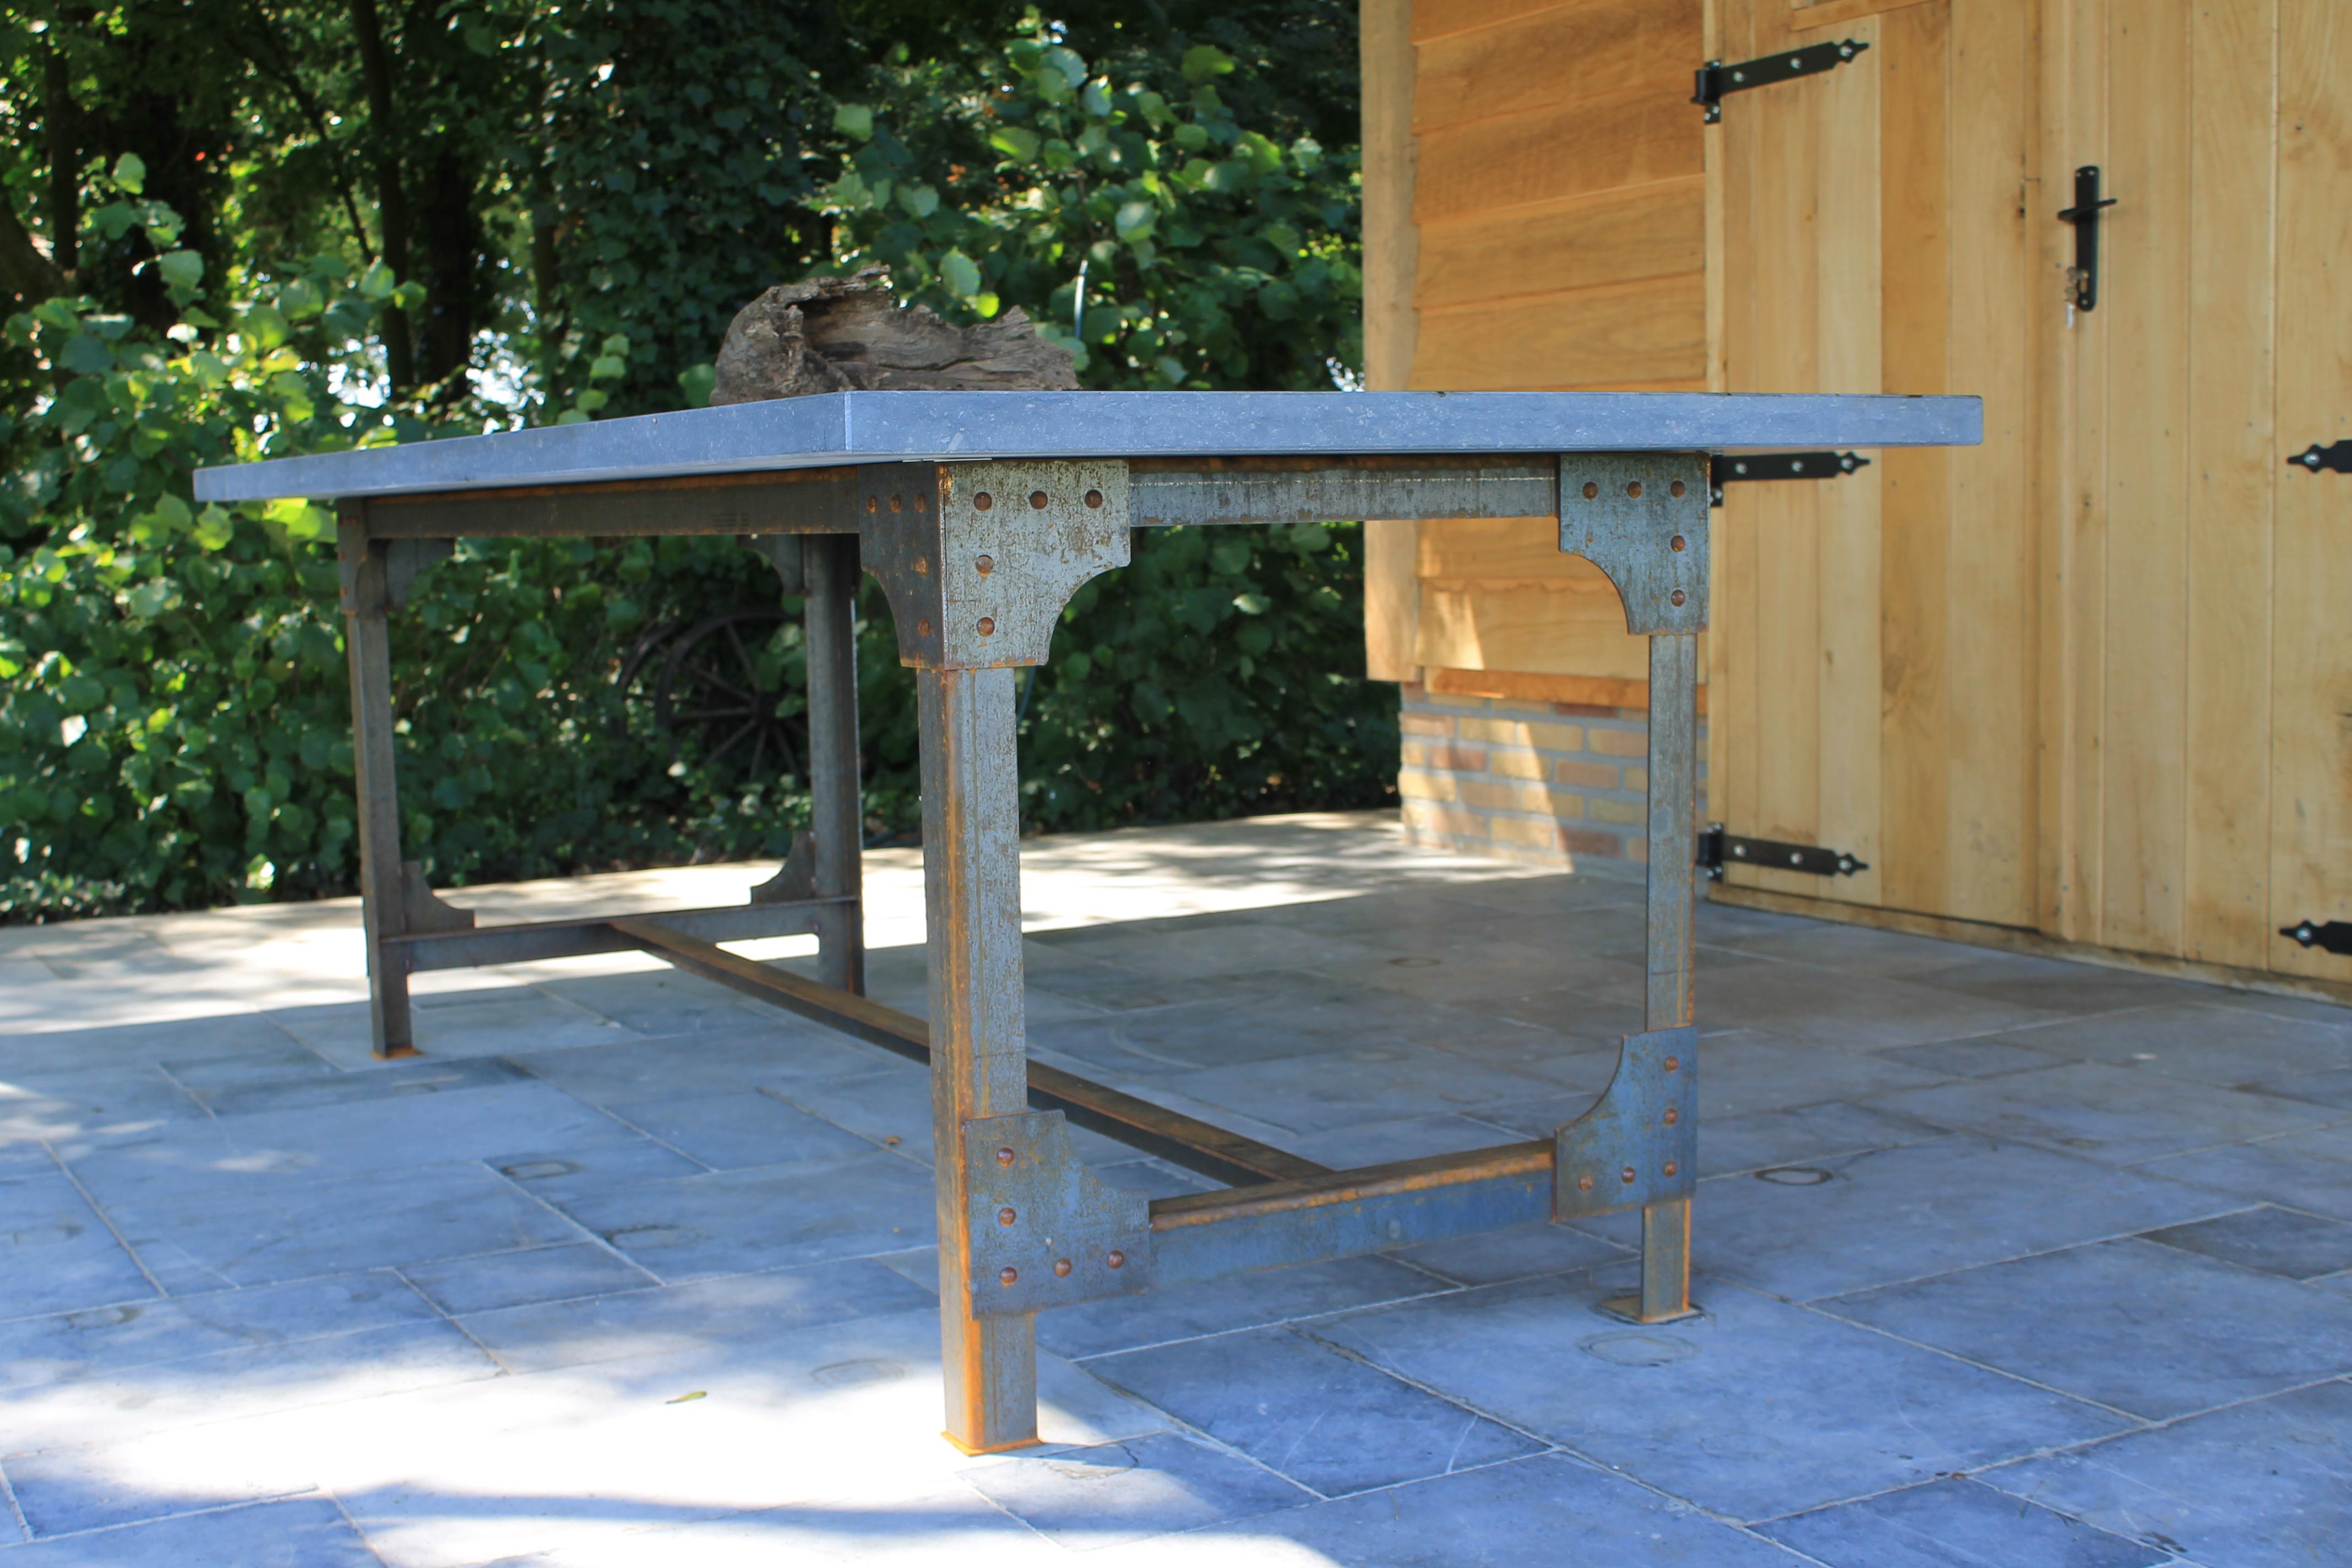 Overzicht natuursteen tafels ardworks for Tafels overzicht